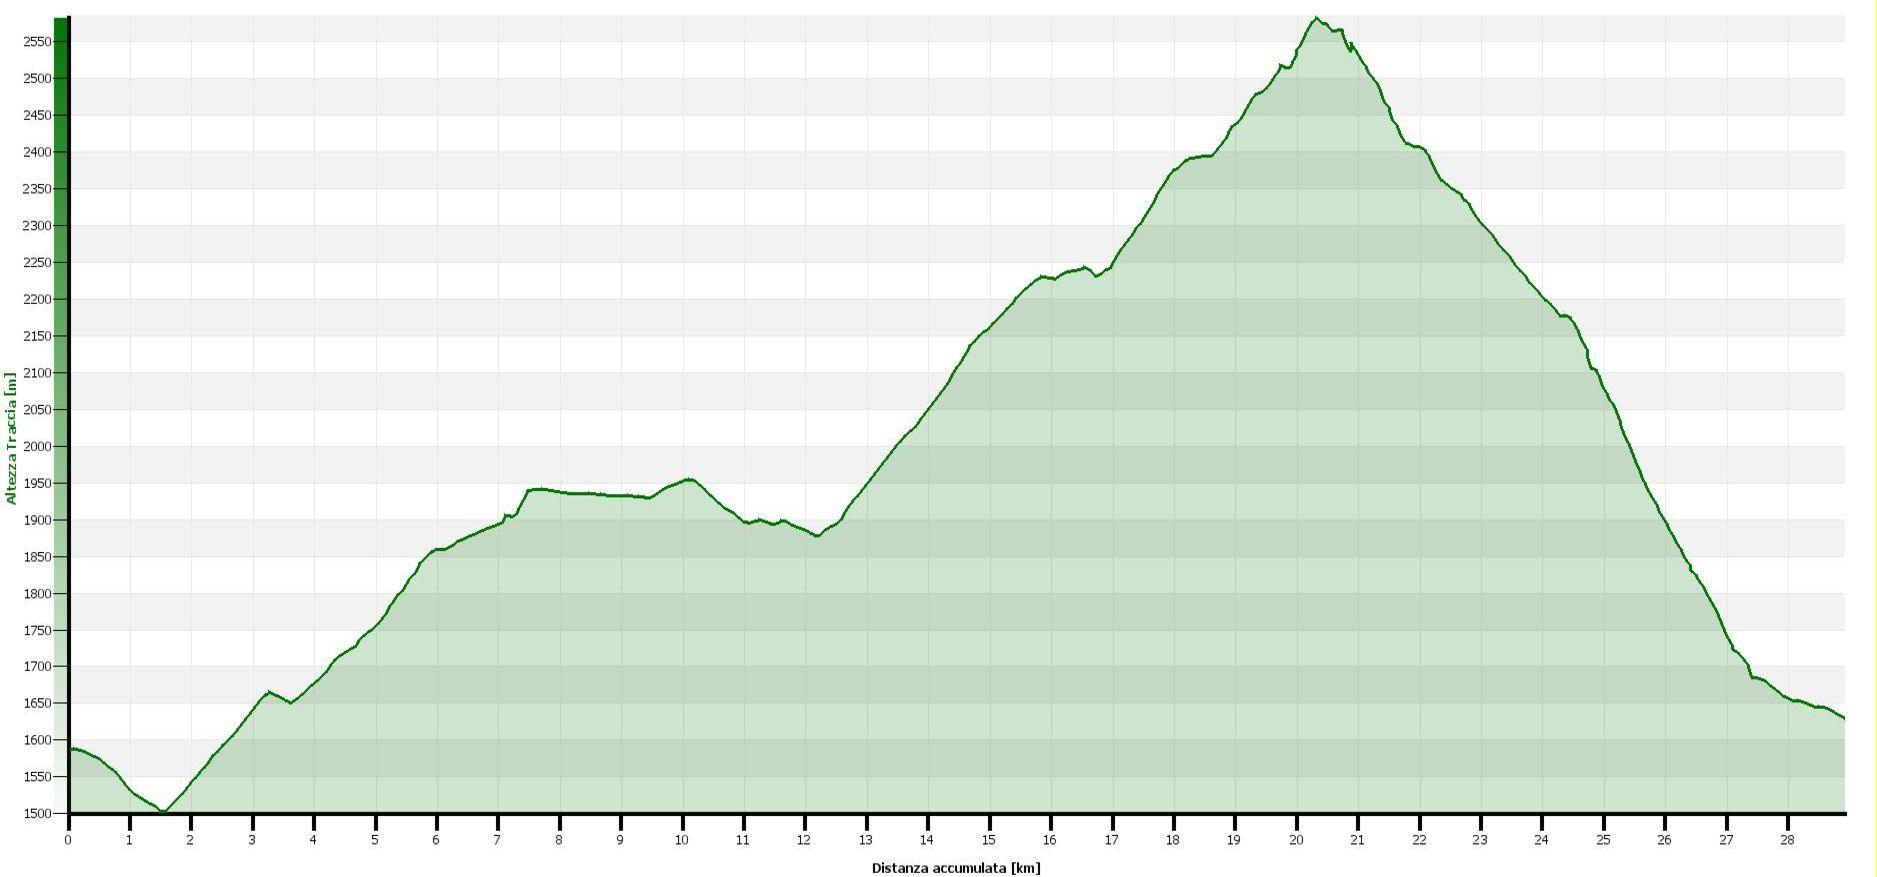 Giro del Monte Morion - Altimetrie